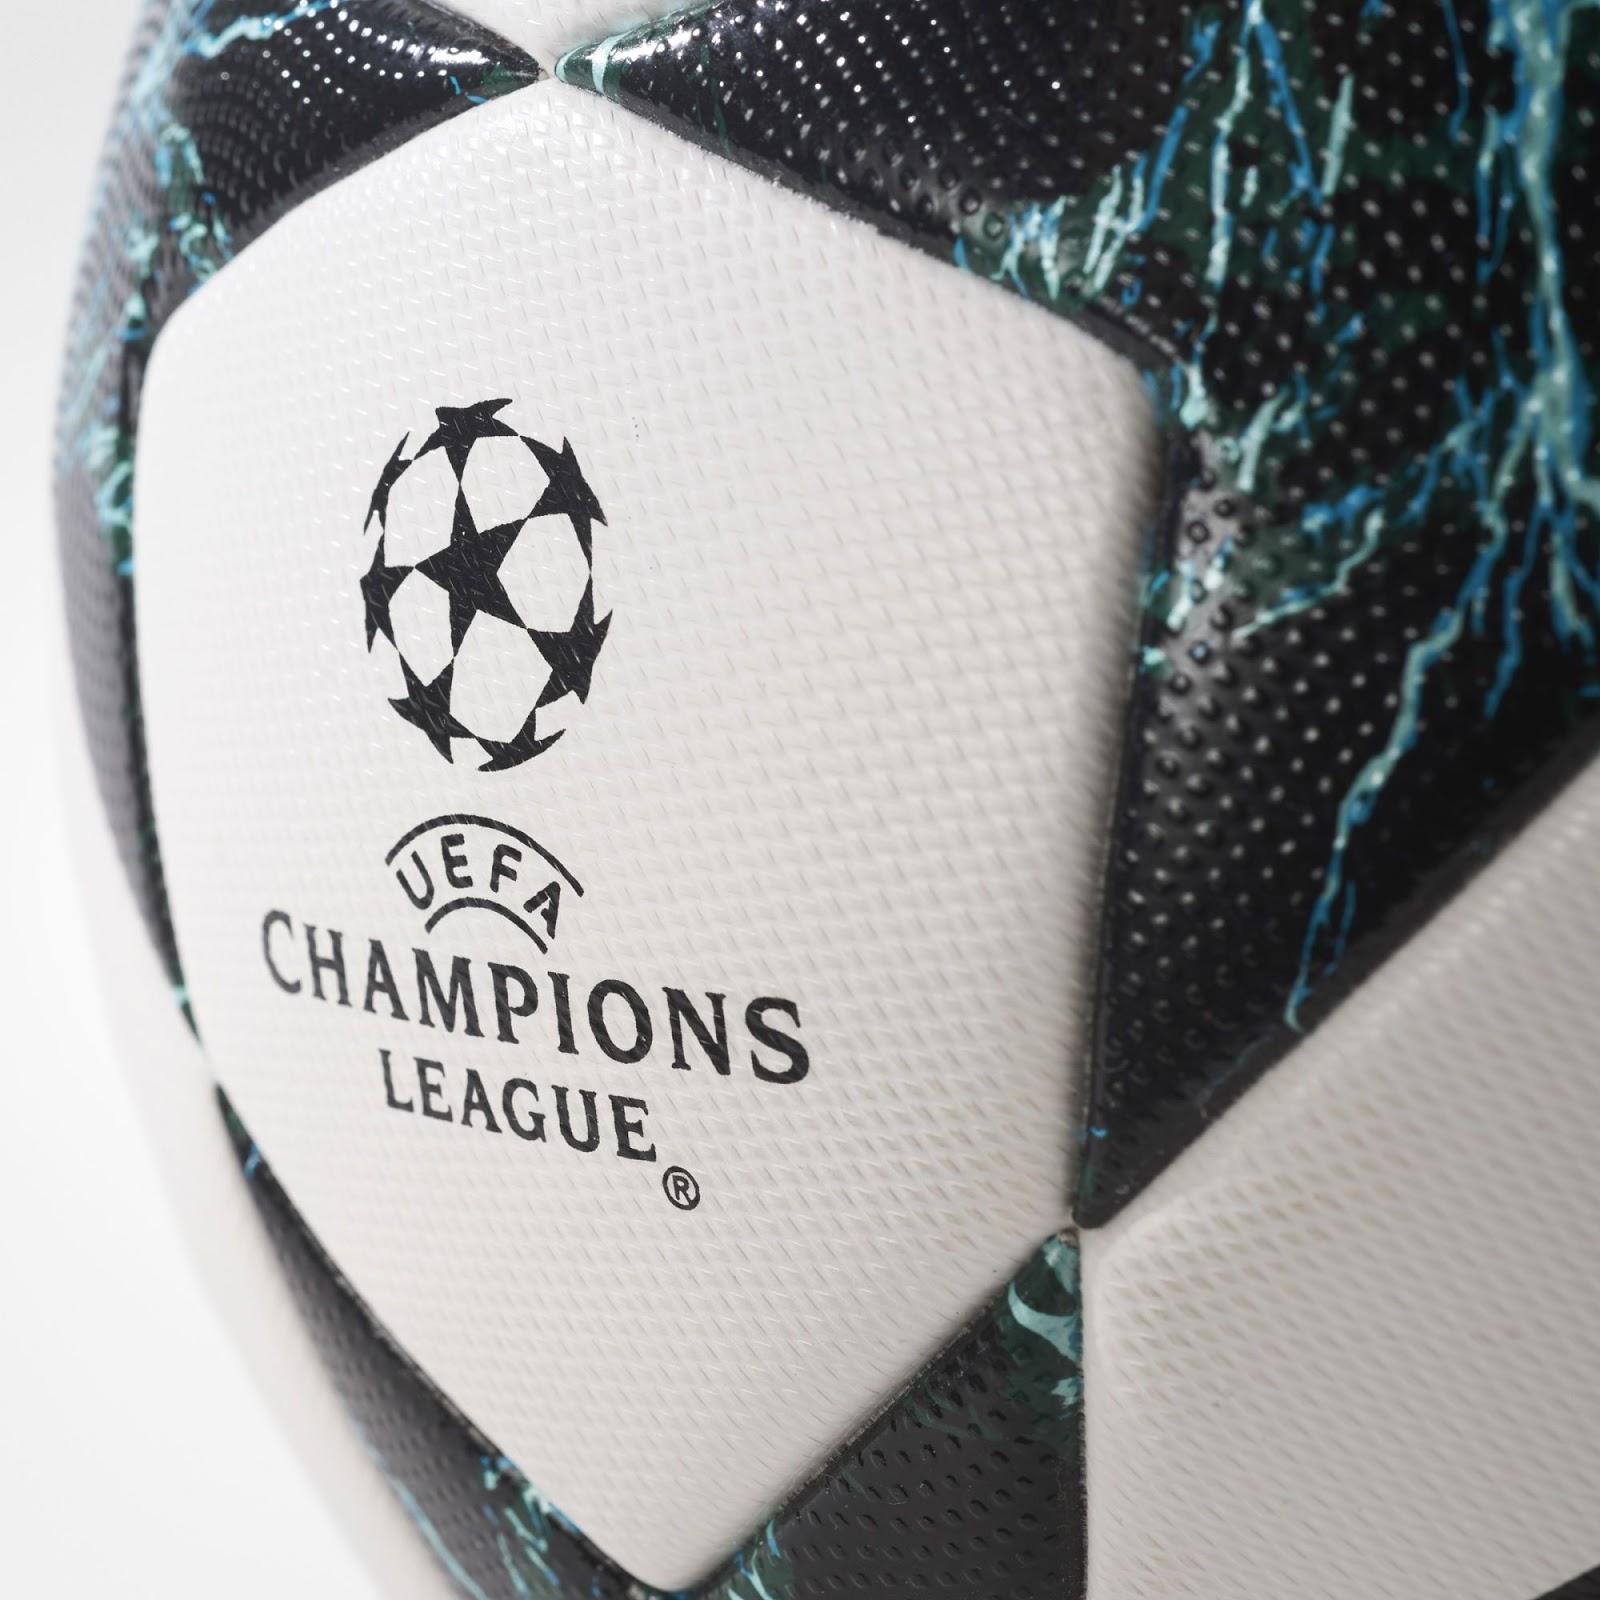 Se presentó la nueva pelota adidas para la Champions League 2017/18